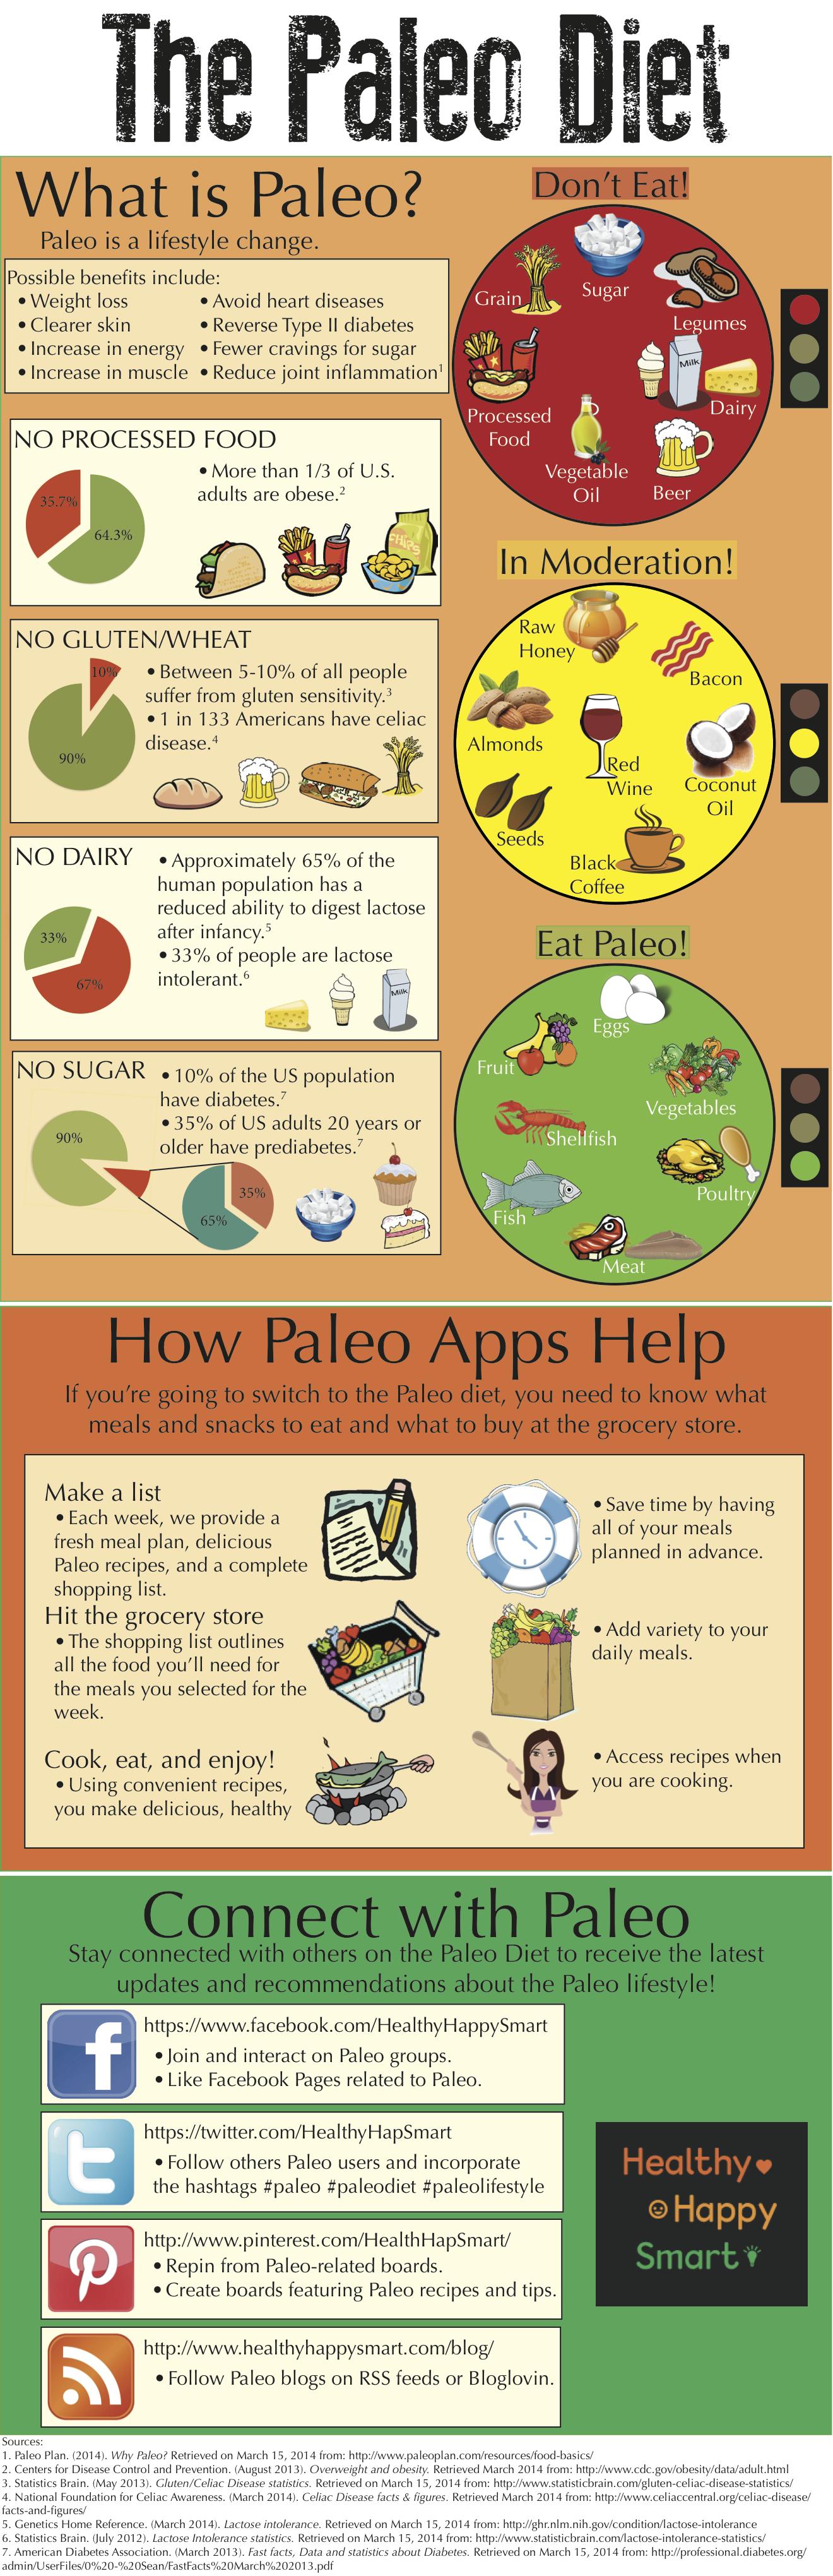 Paleo Diet Infographic #HealthyHappySmart #Paleo